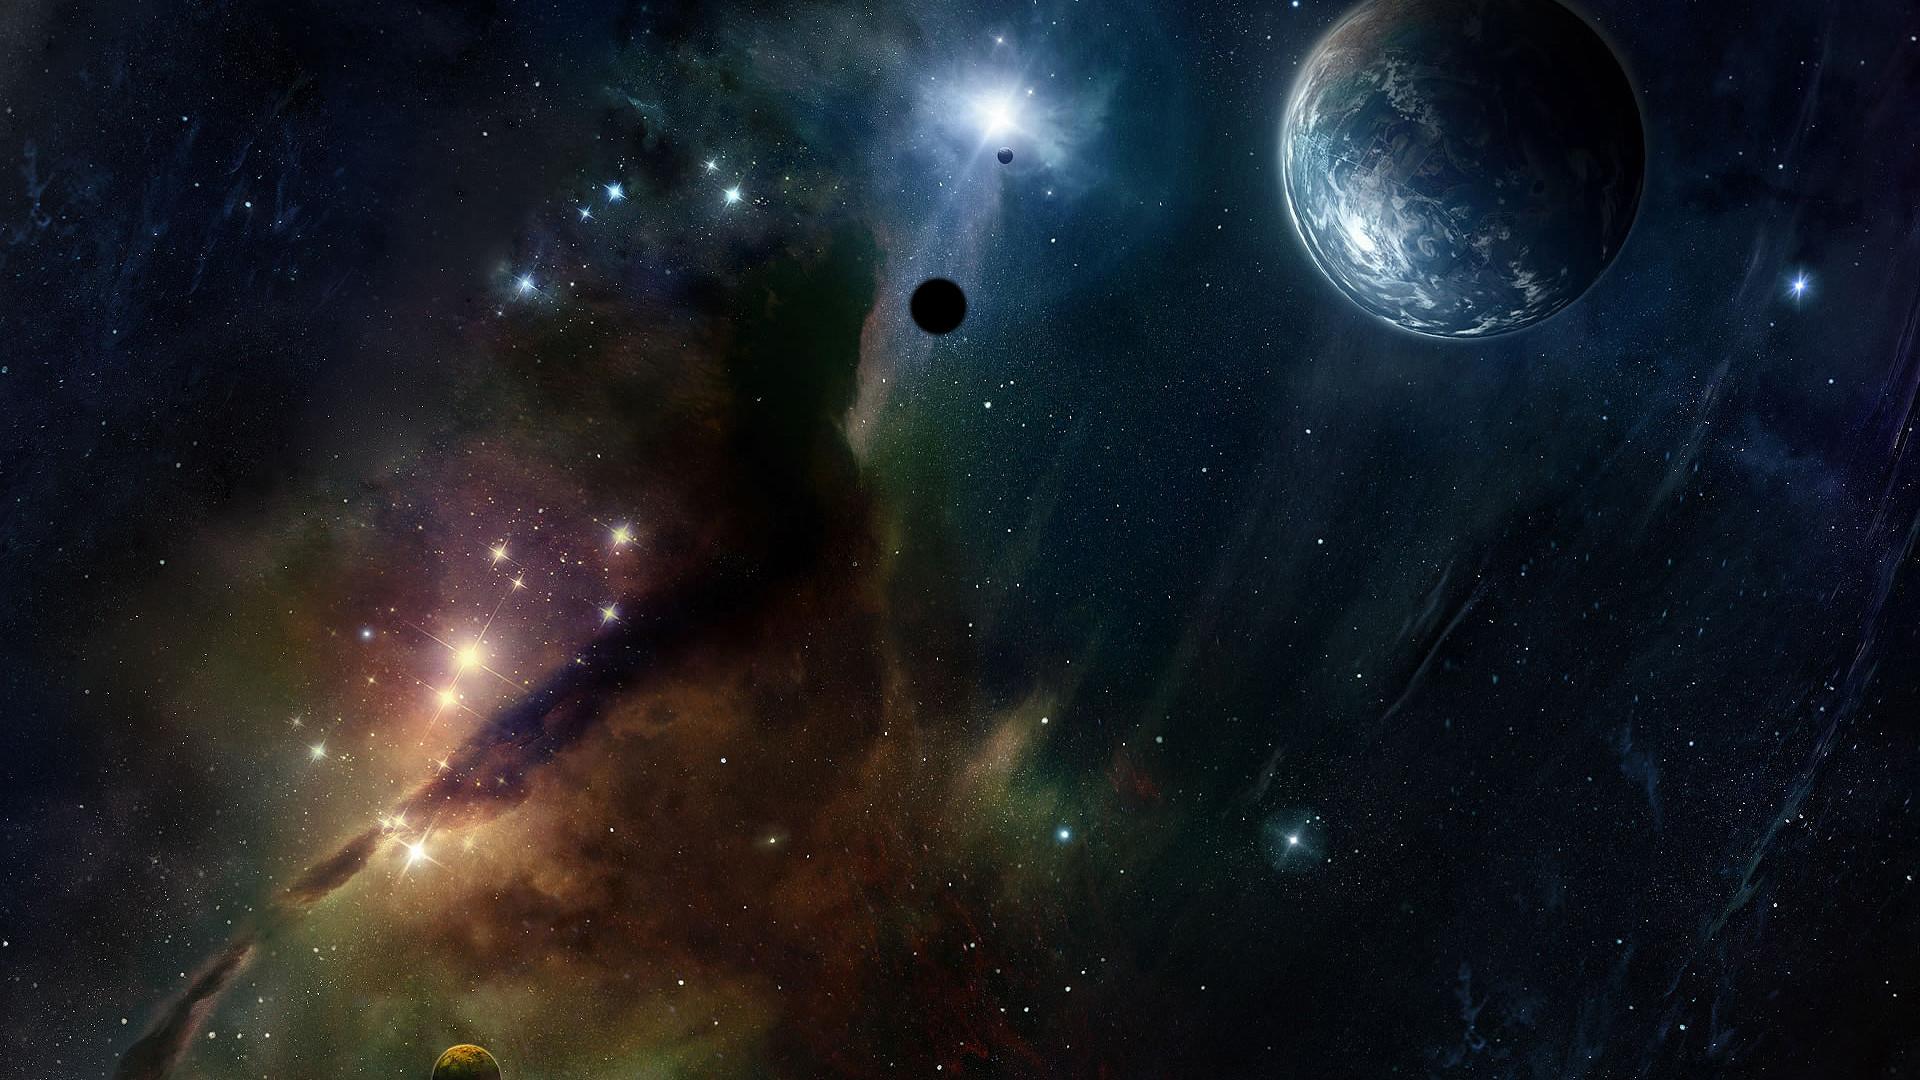 Space/Nasa Wallpapers   Wallpapers Inbox